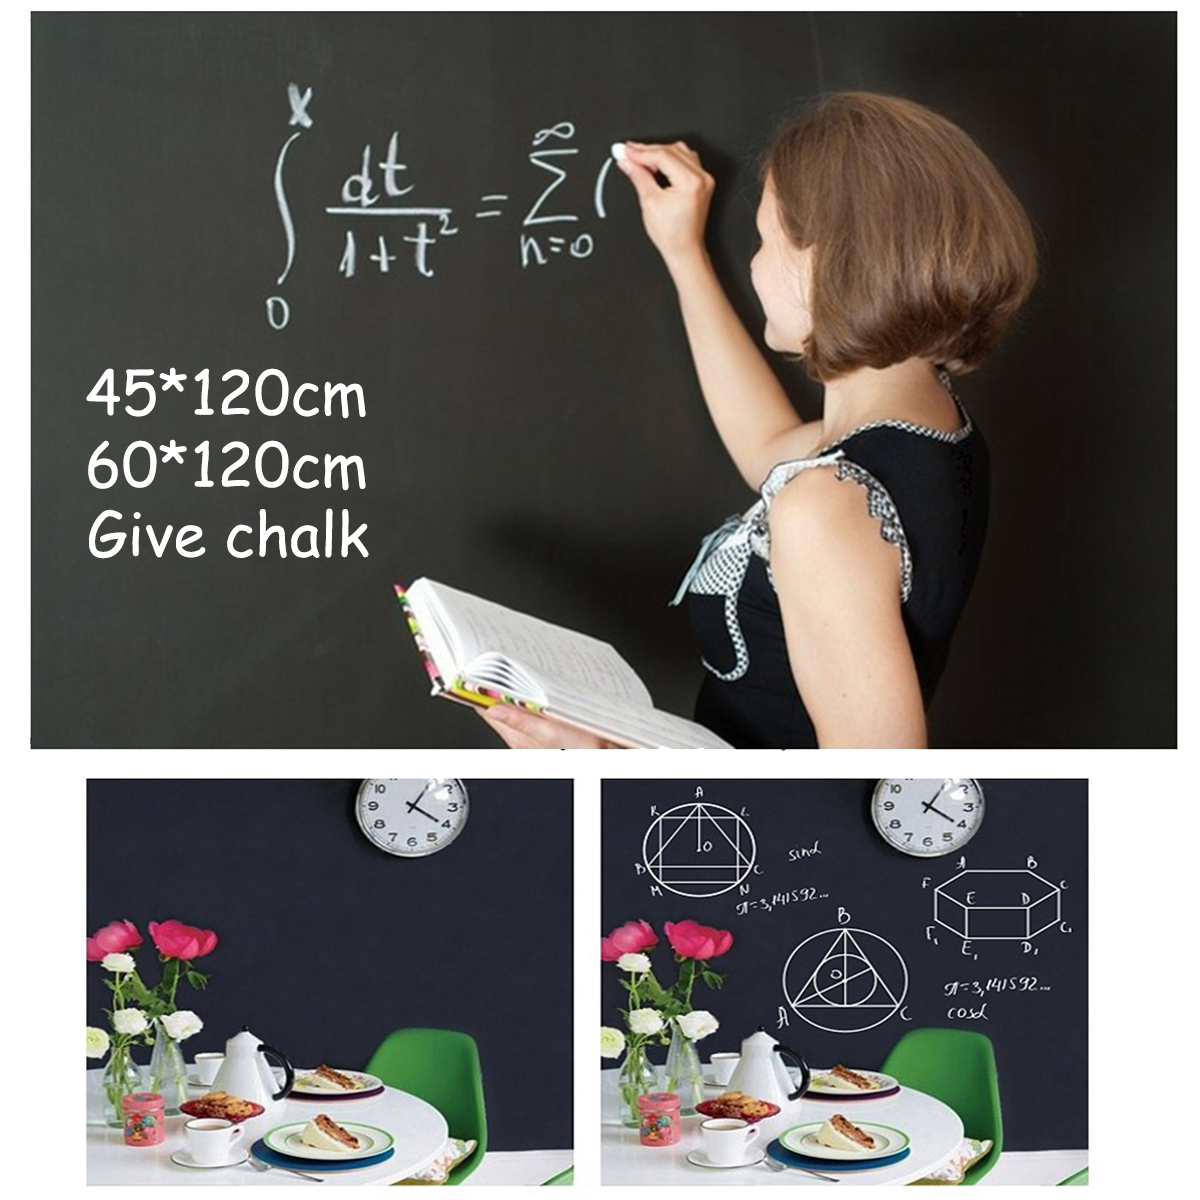 New Creative 60x200cm Chalk Board Blackboard Vinyl Draw Chalkboard Label Month Calendar Weekly Record Blackboard Wall Stickers in Wall Stickers from Home Garden